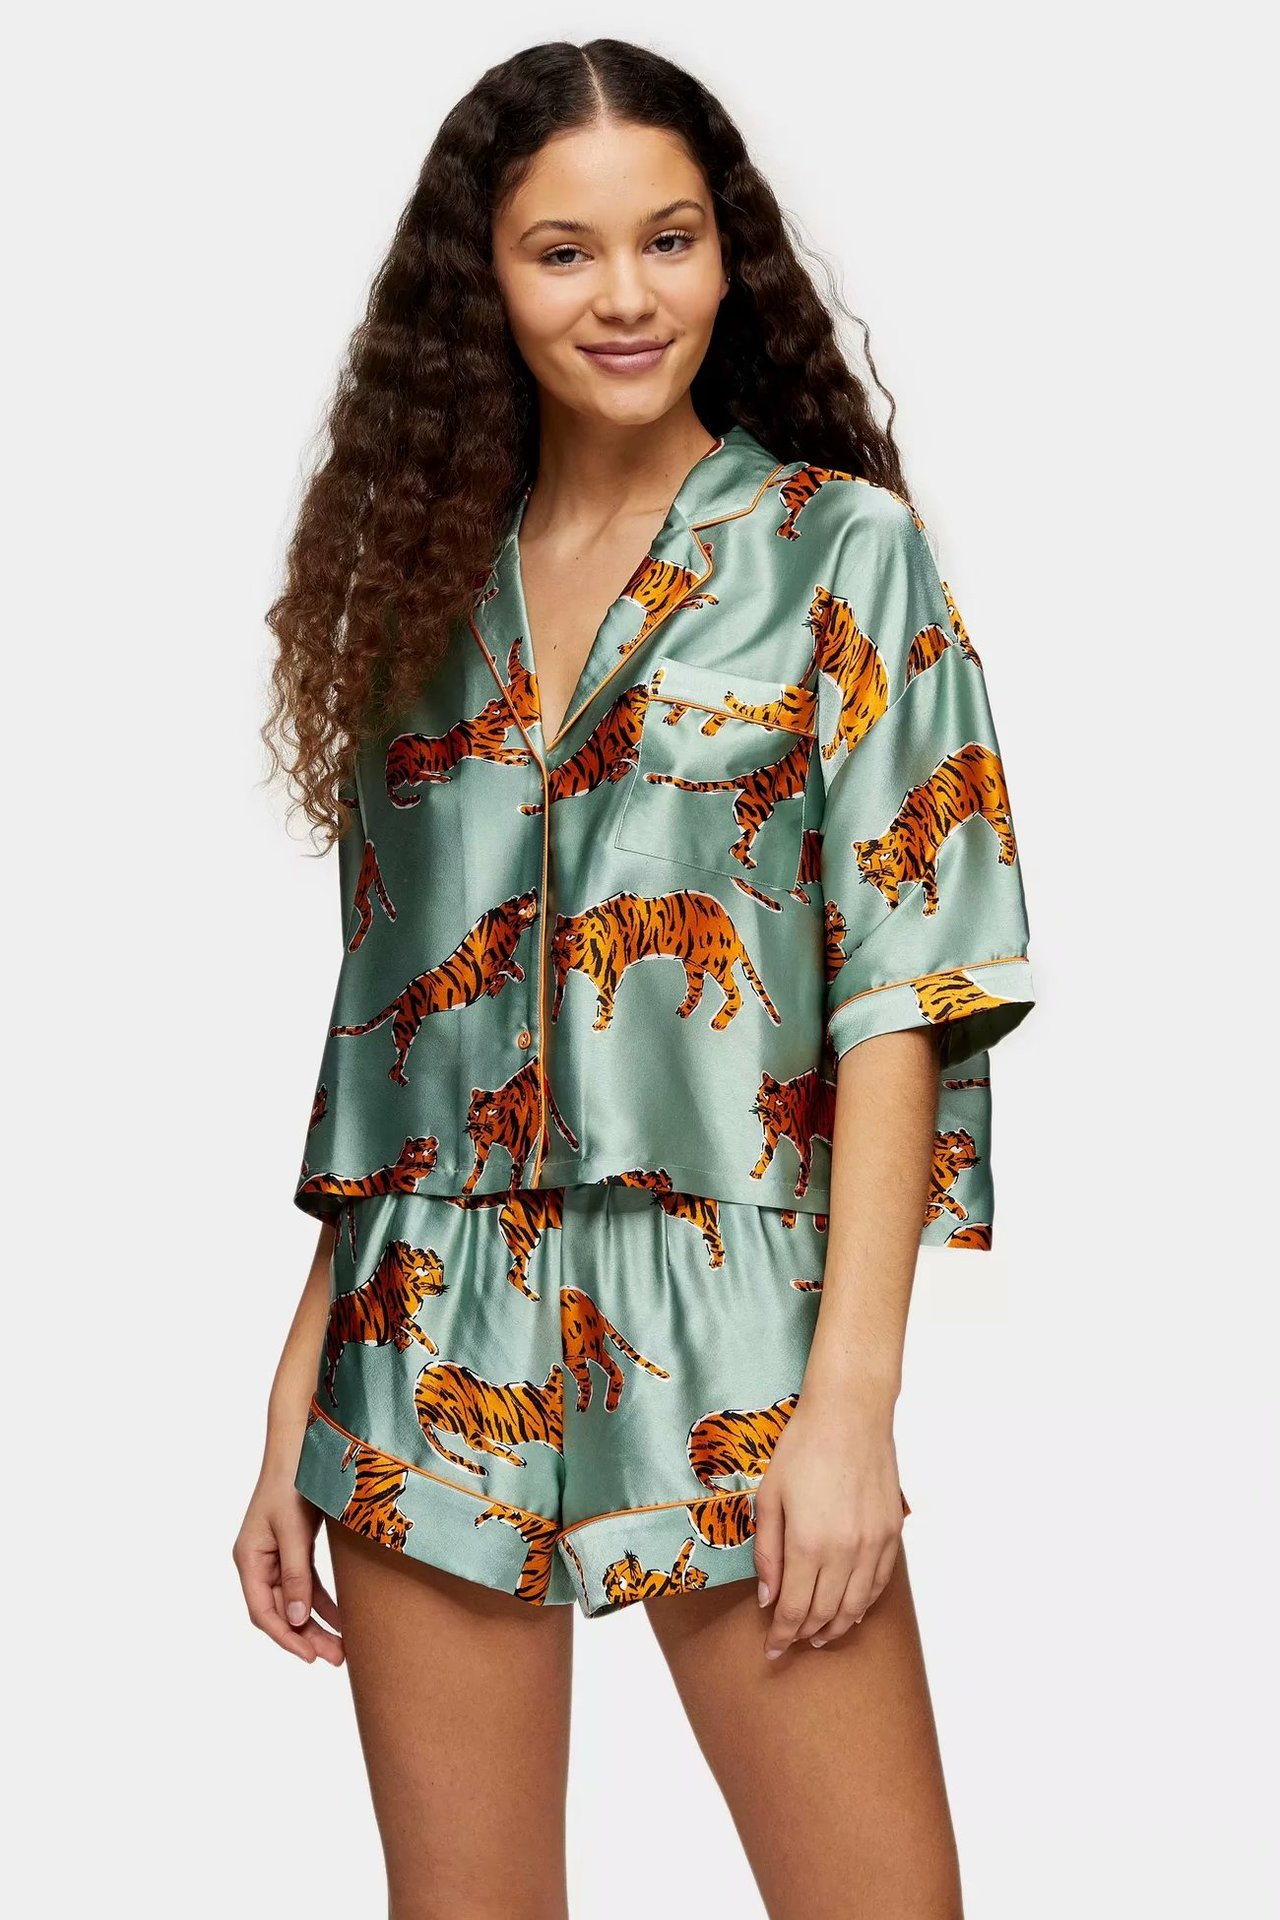 2020 Summer New Lapel Animal Zaraing Sheining Vadiming Women Female Blouse Shirt And Shorts Suit Elastic Waist Wd87228